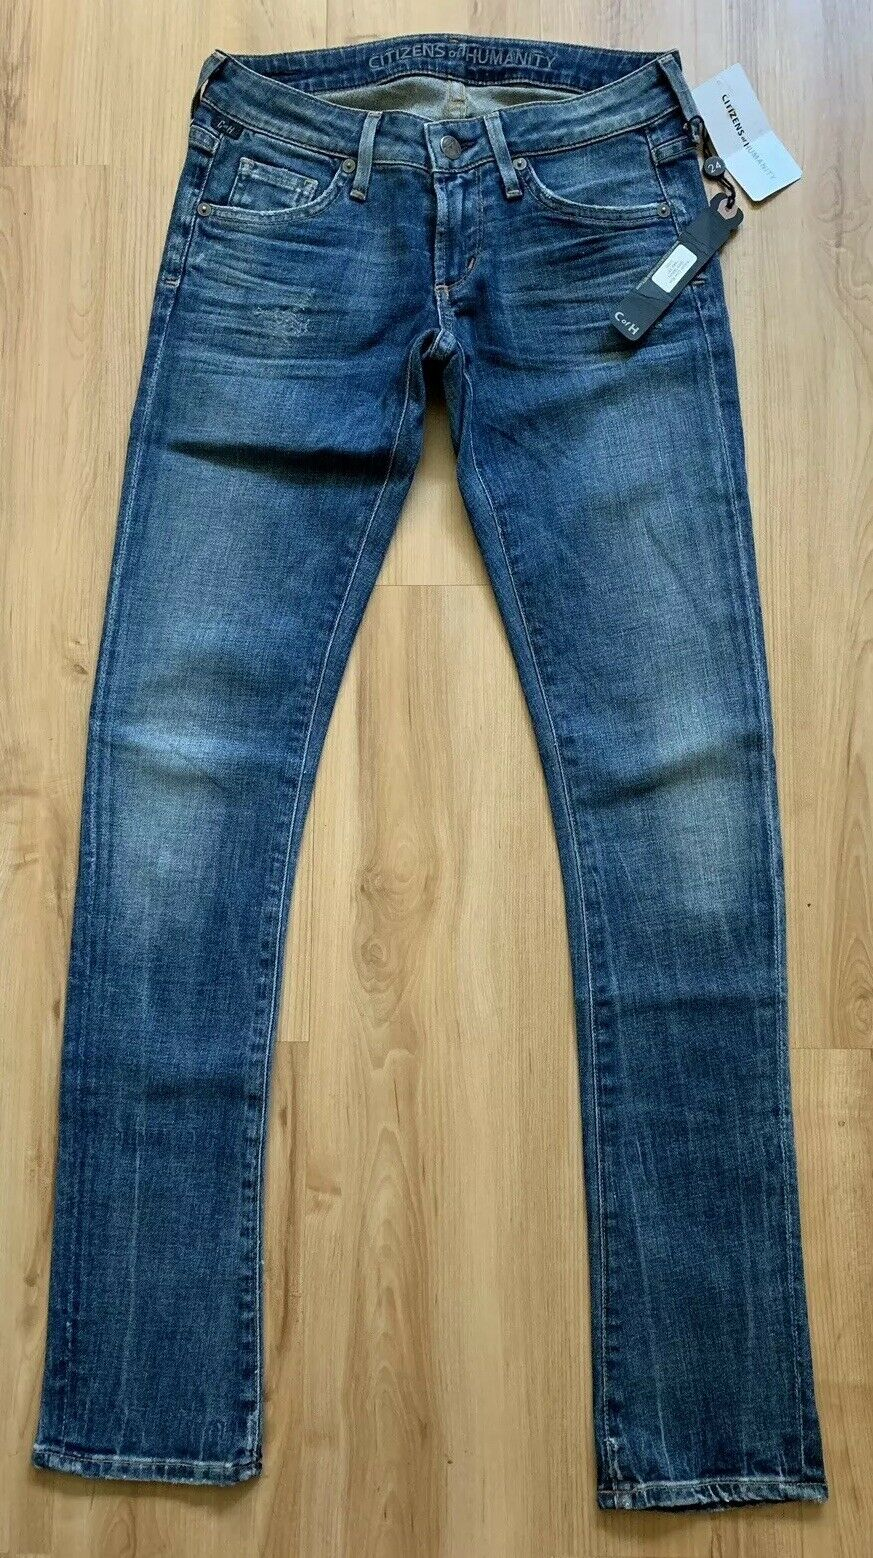 CITIZENS OF HUMANITY Racer Low Rise Ultra Skinny Denim Jeans Slash bluee Sz 24